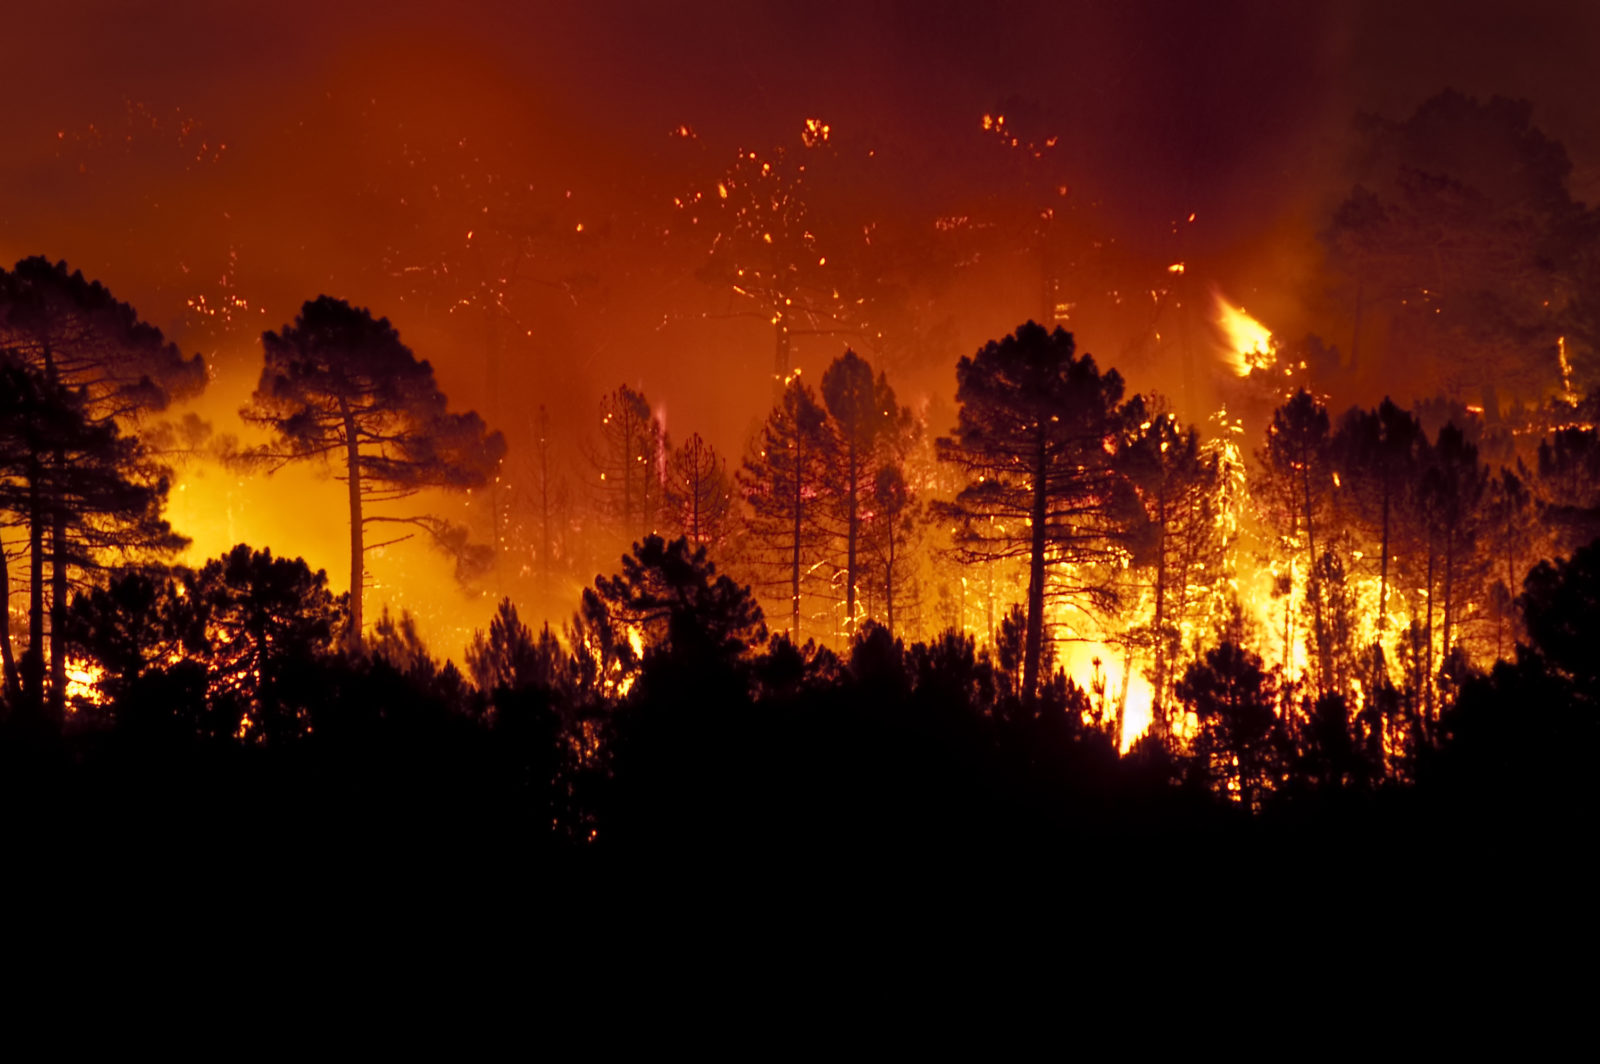 wildfire burning trees